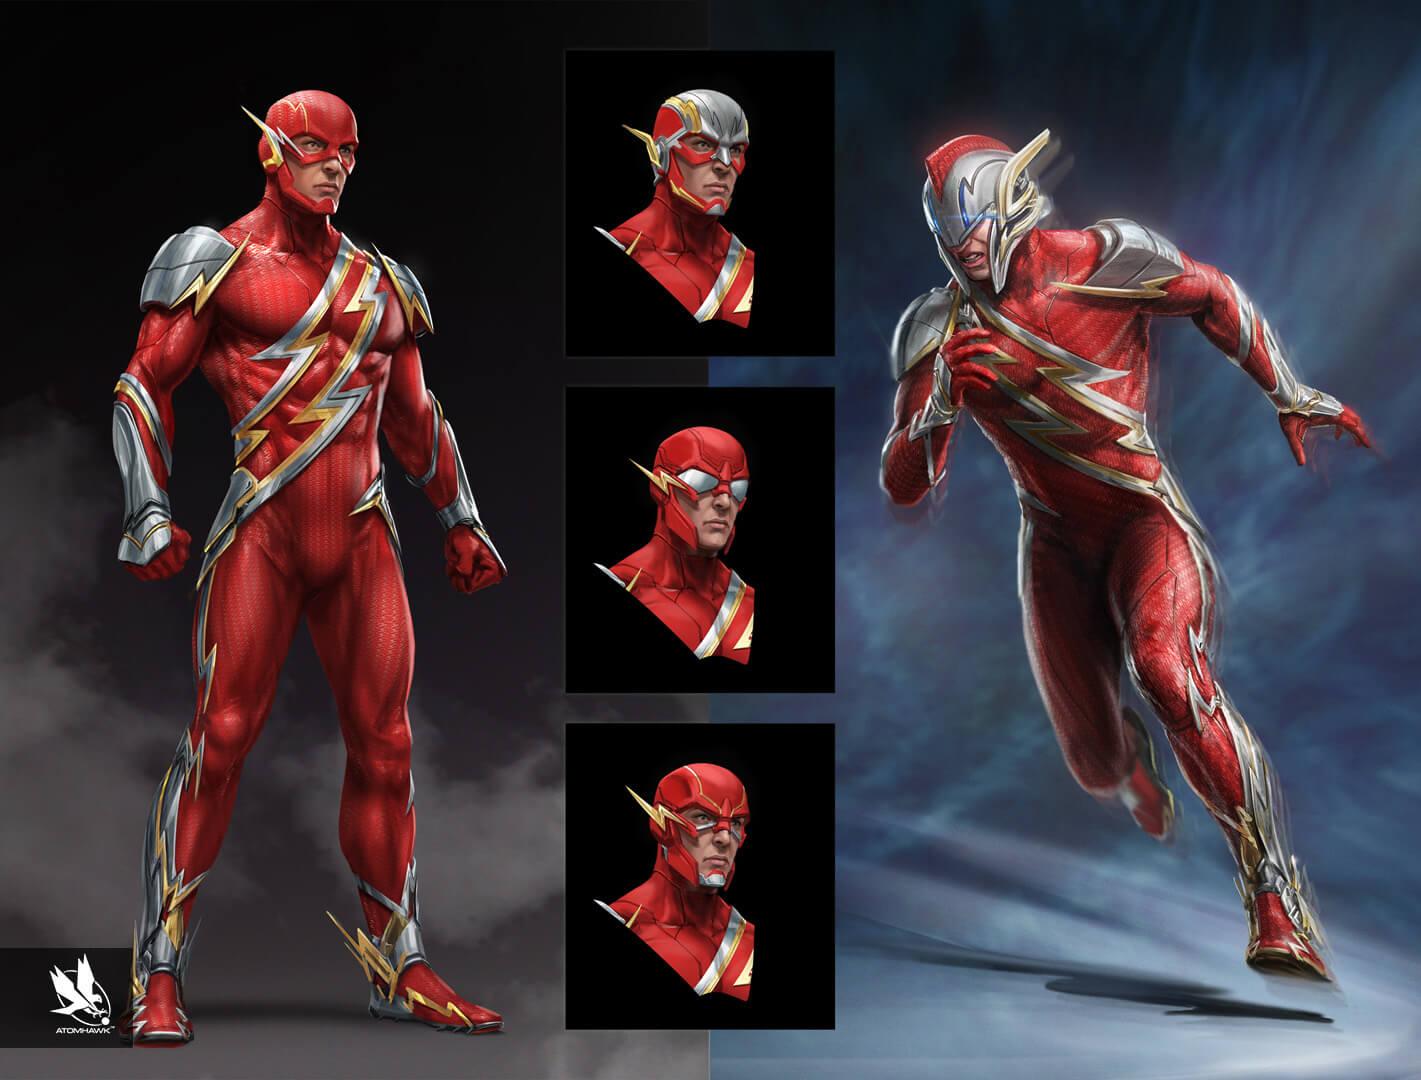 Atomhawk_Warner-Bros-NetherRealm_Injustice-2_Concept-Art_Character-Design_Flash.jpg